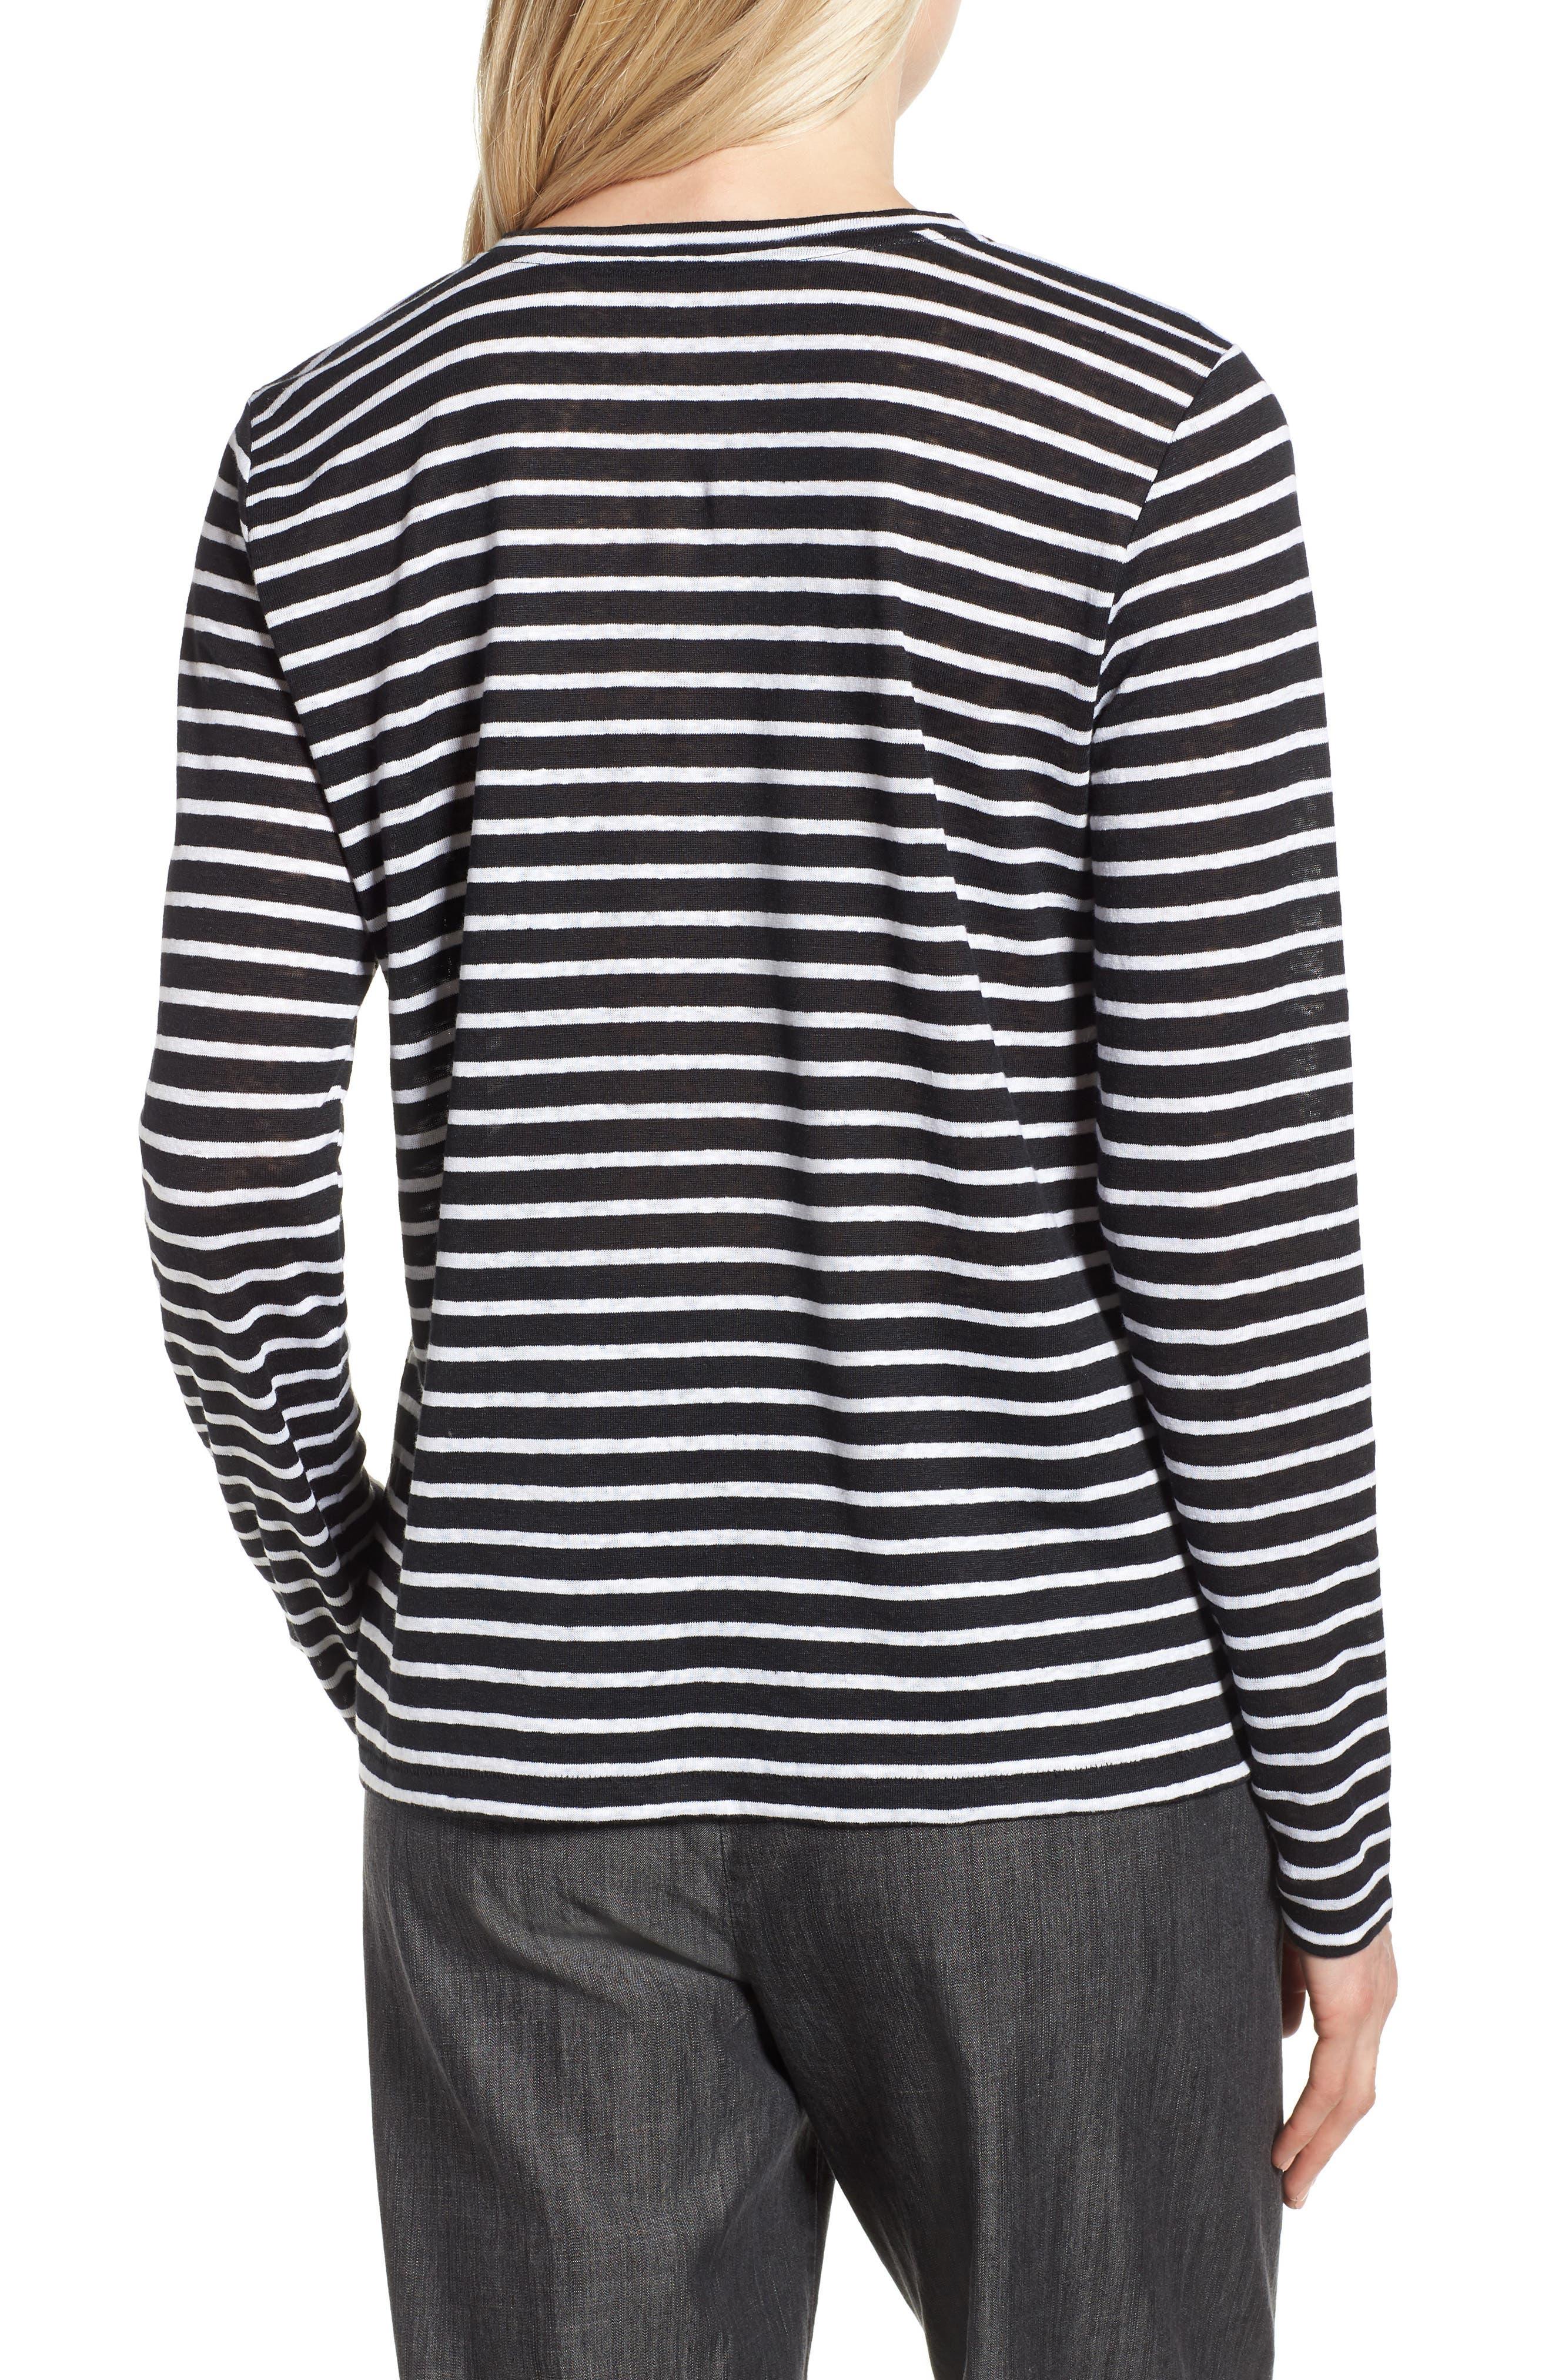 Stripe Organic Linen Top,                             Alternate thumbnail 2, color,                             018